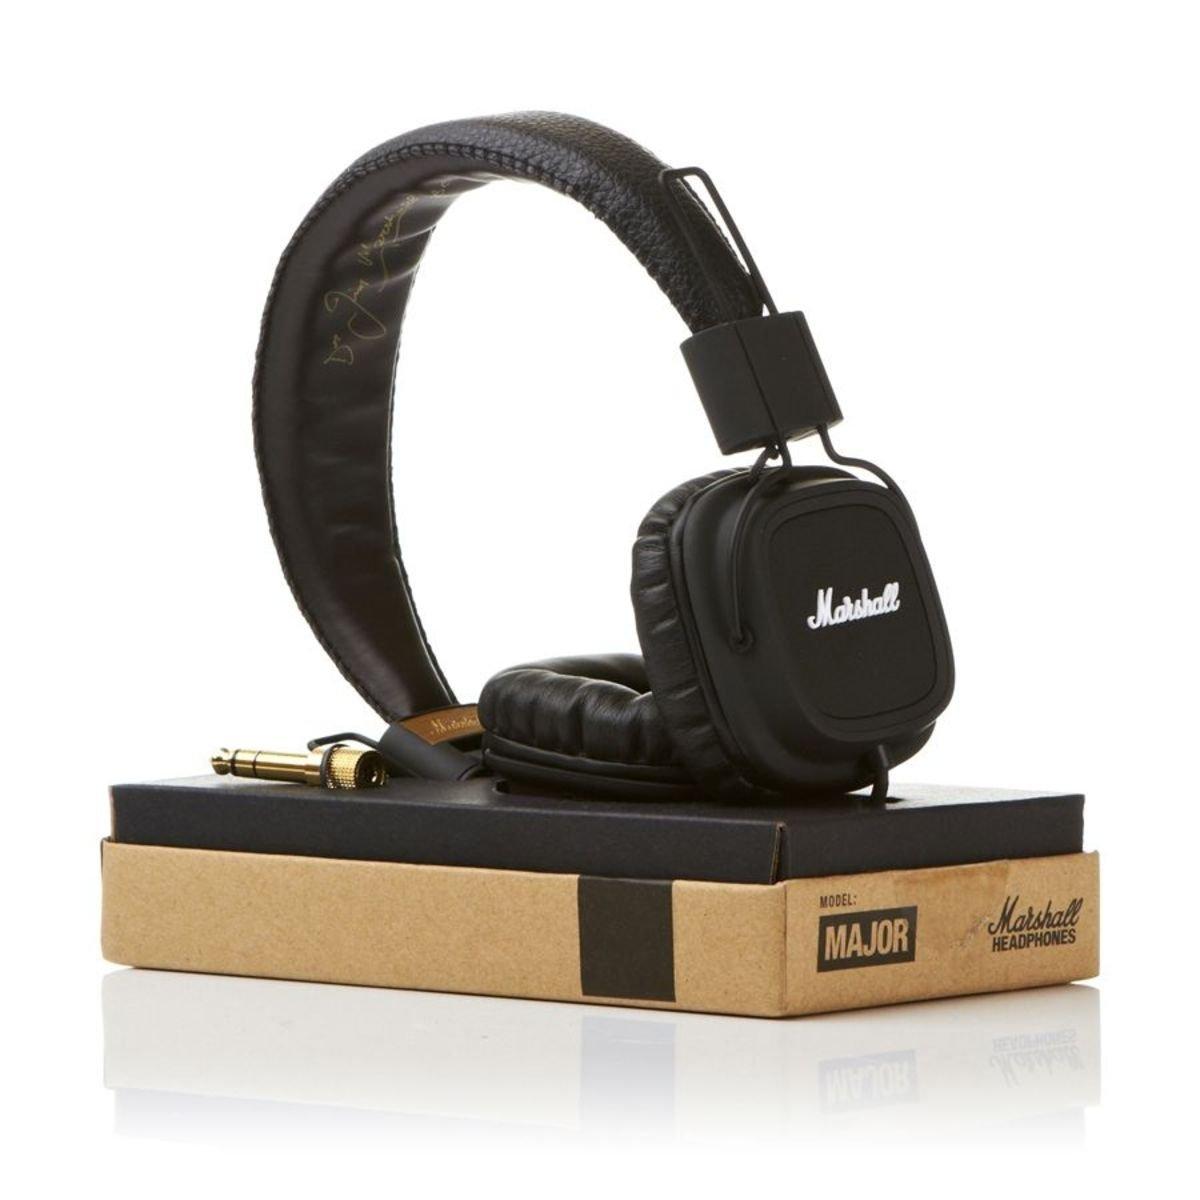 SMZ E2 3.5 Mm Ear Hook Design In-ear Earphones With 1.0 M Cable (black) Under $50